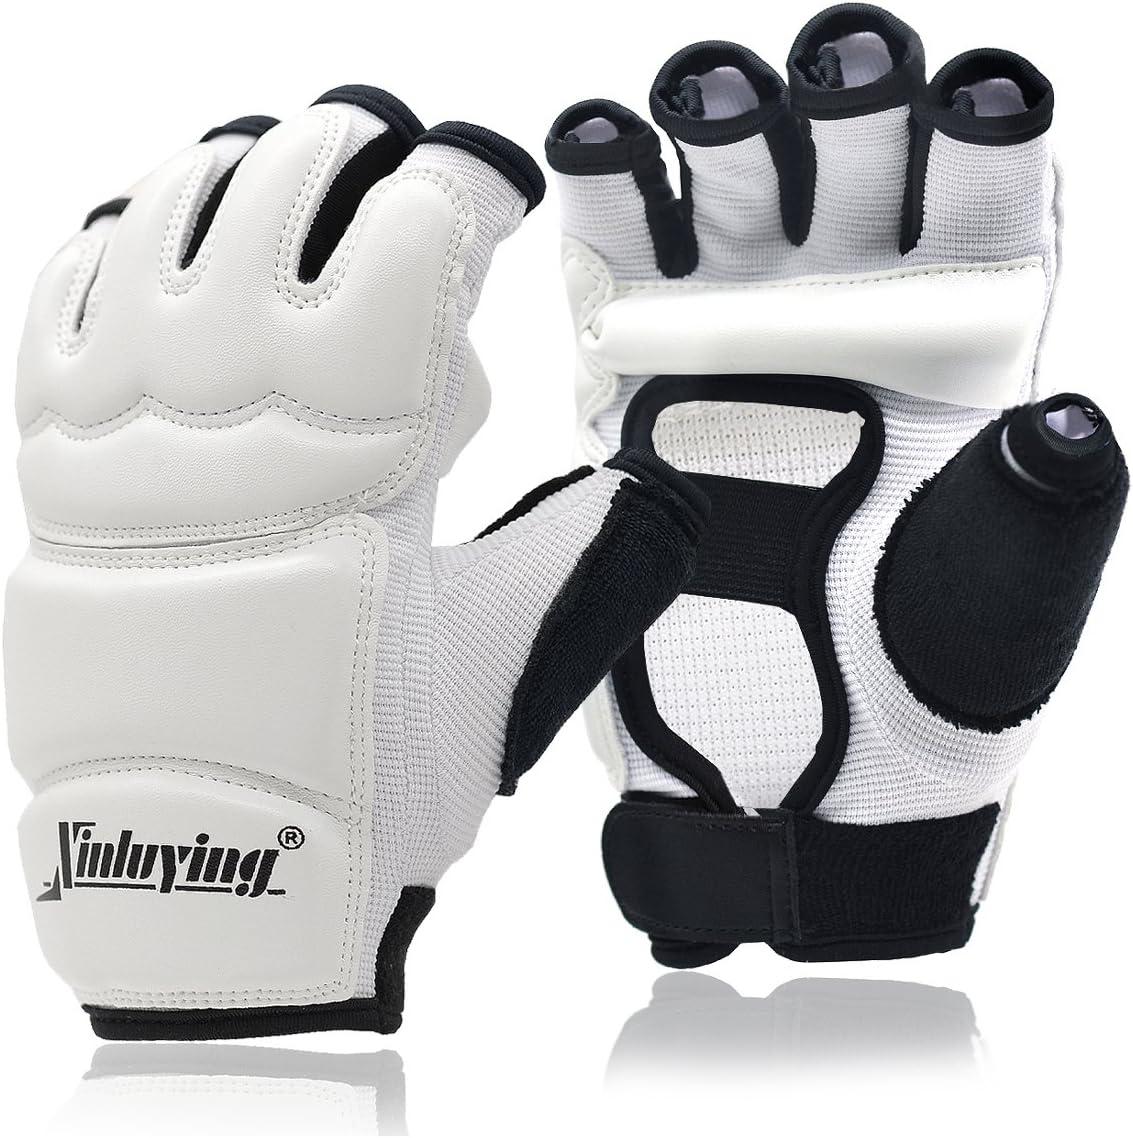 Xinluying Punch Bag Taekwondo Karate Gloves for Sparring Martial Arts Boxing Training Fingerless Women Kids : Sports & Outdoors